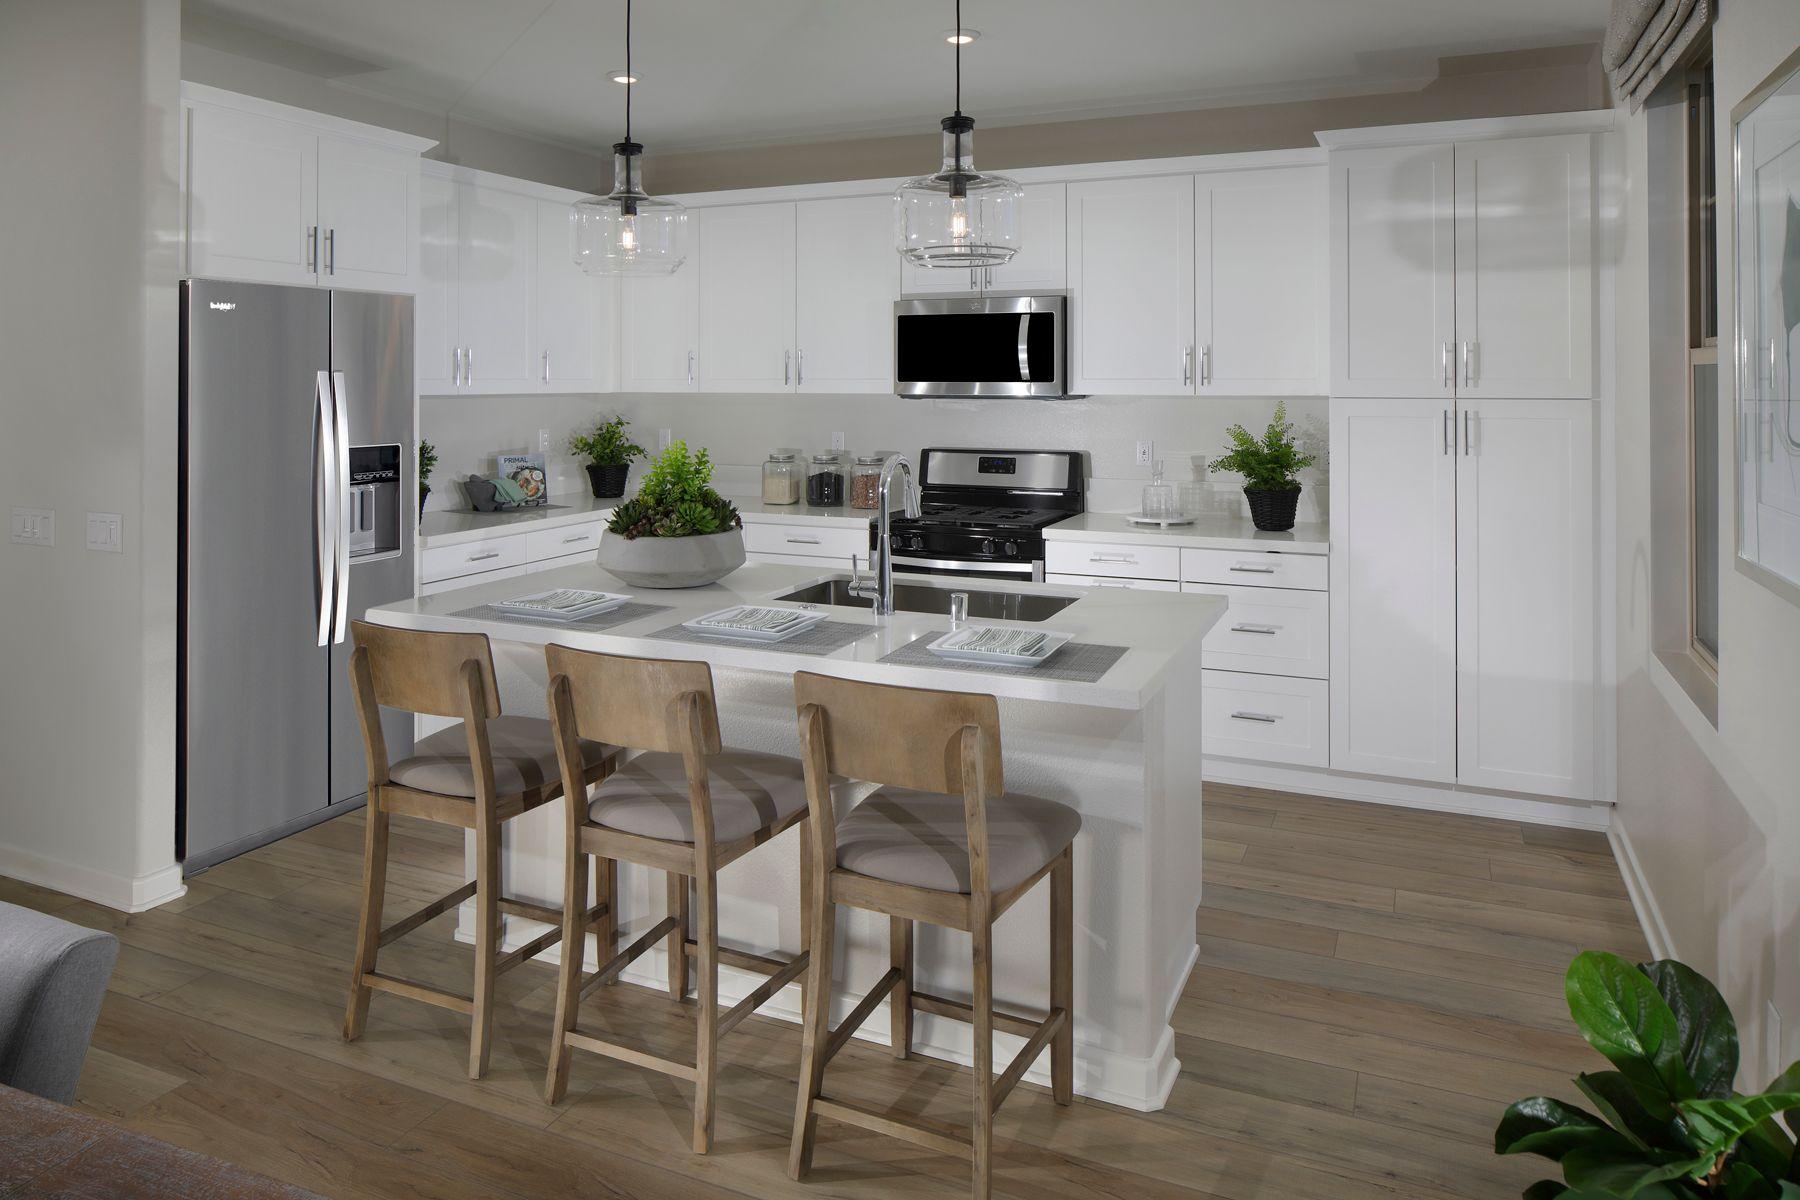 Kitchen featured in the Plan 2 By Century Communities in Riverside-San Bernardino, CA